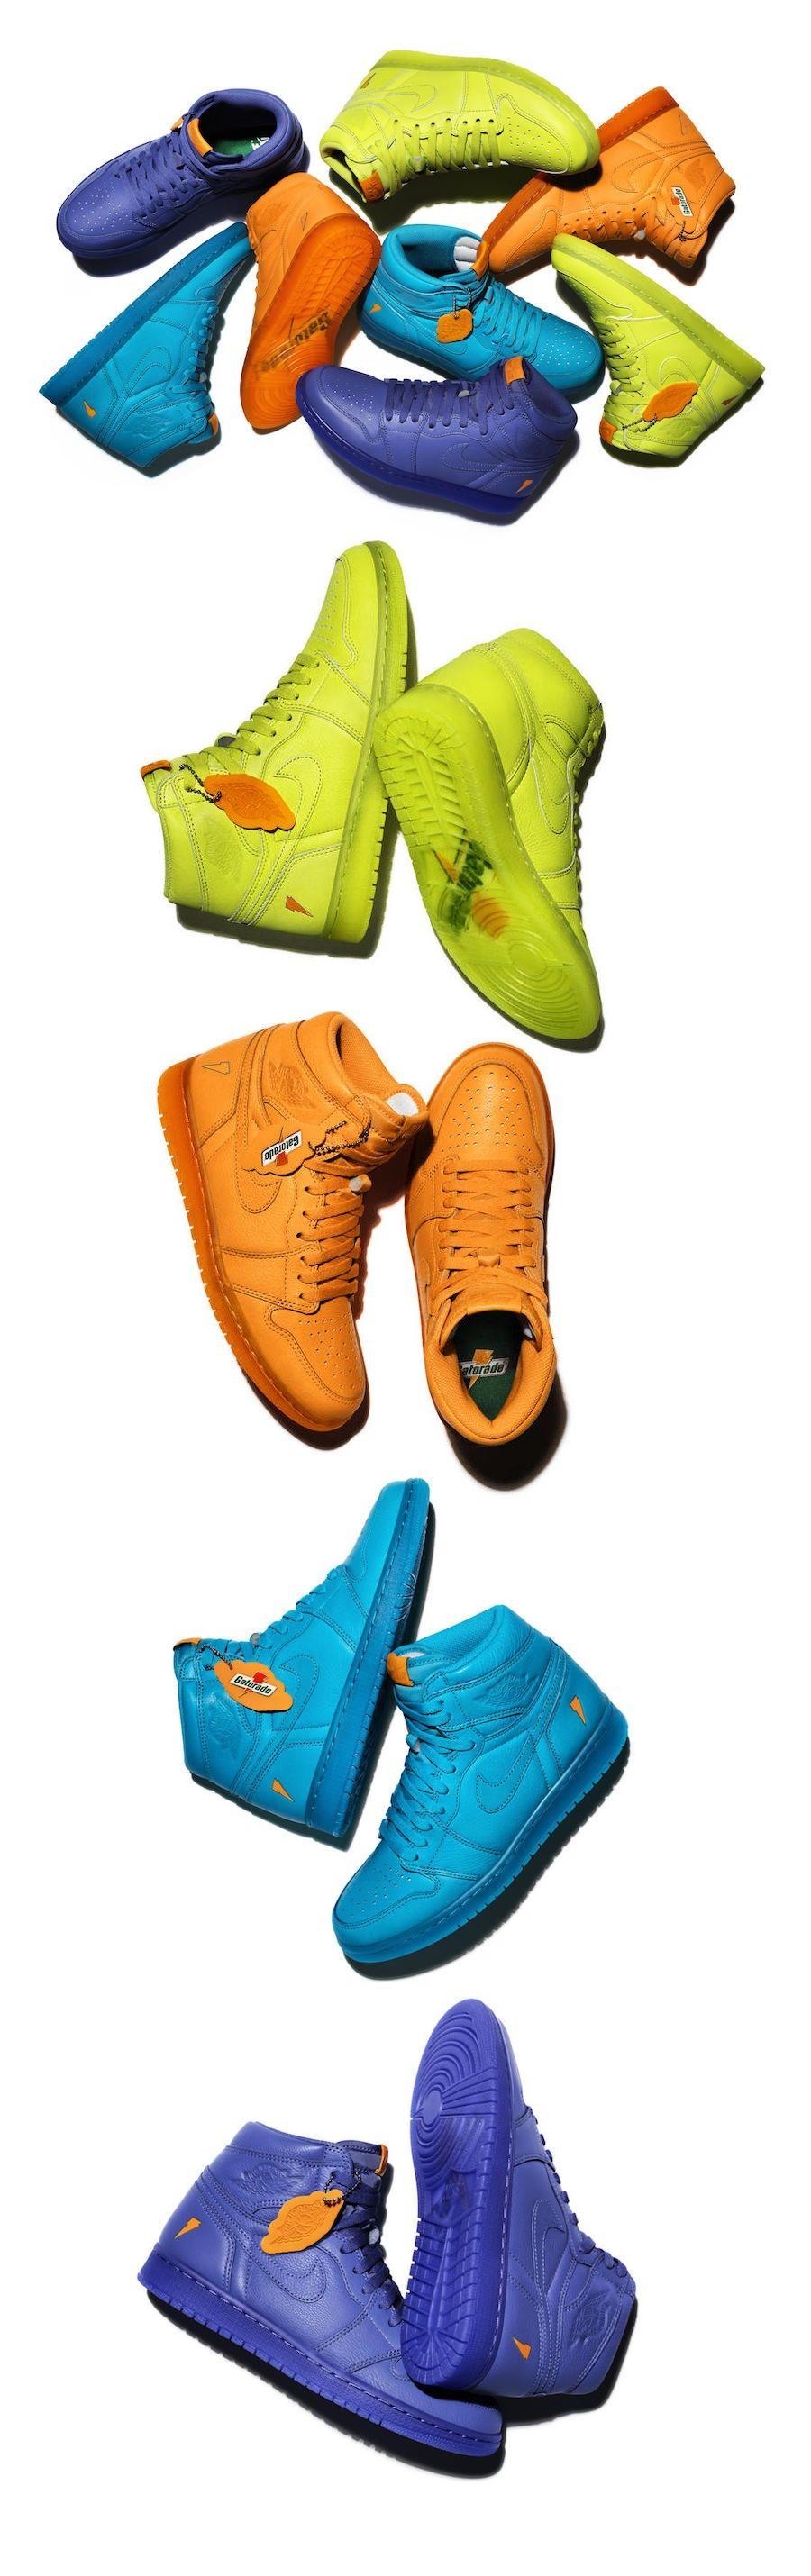 0a0e9459ba4 Sneaker Review: Air Jordan 1 Retro Gatorade Pack – Purchase Links #Gatorade  #AirJordan #JordanBrand